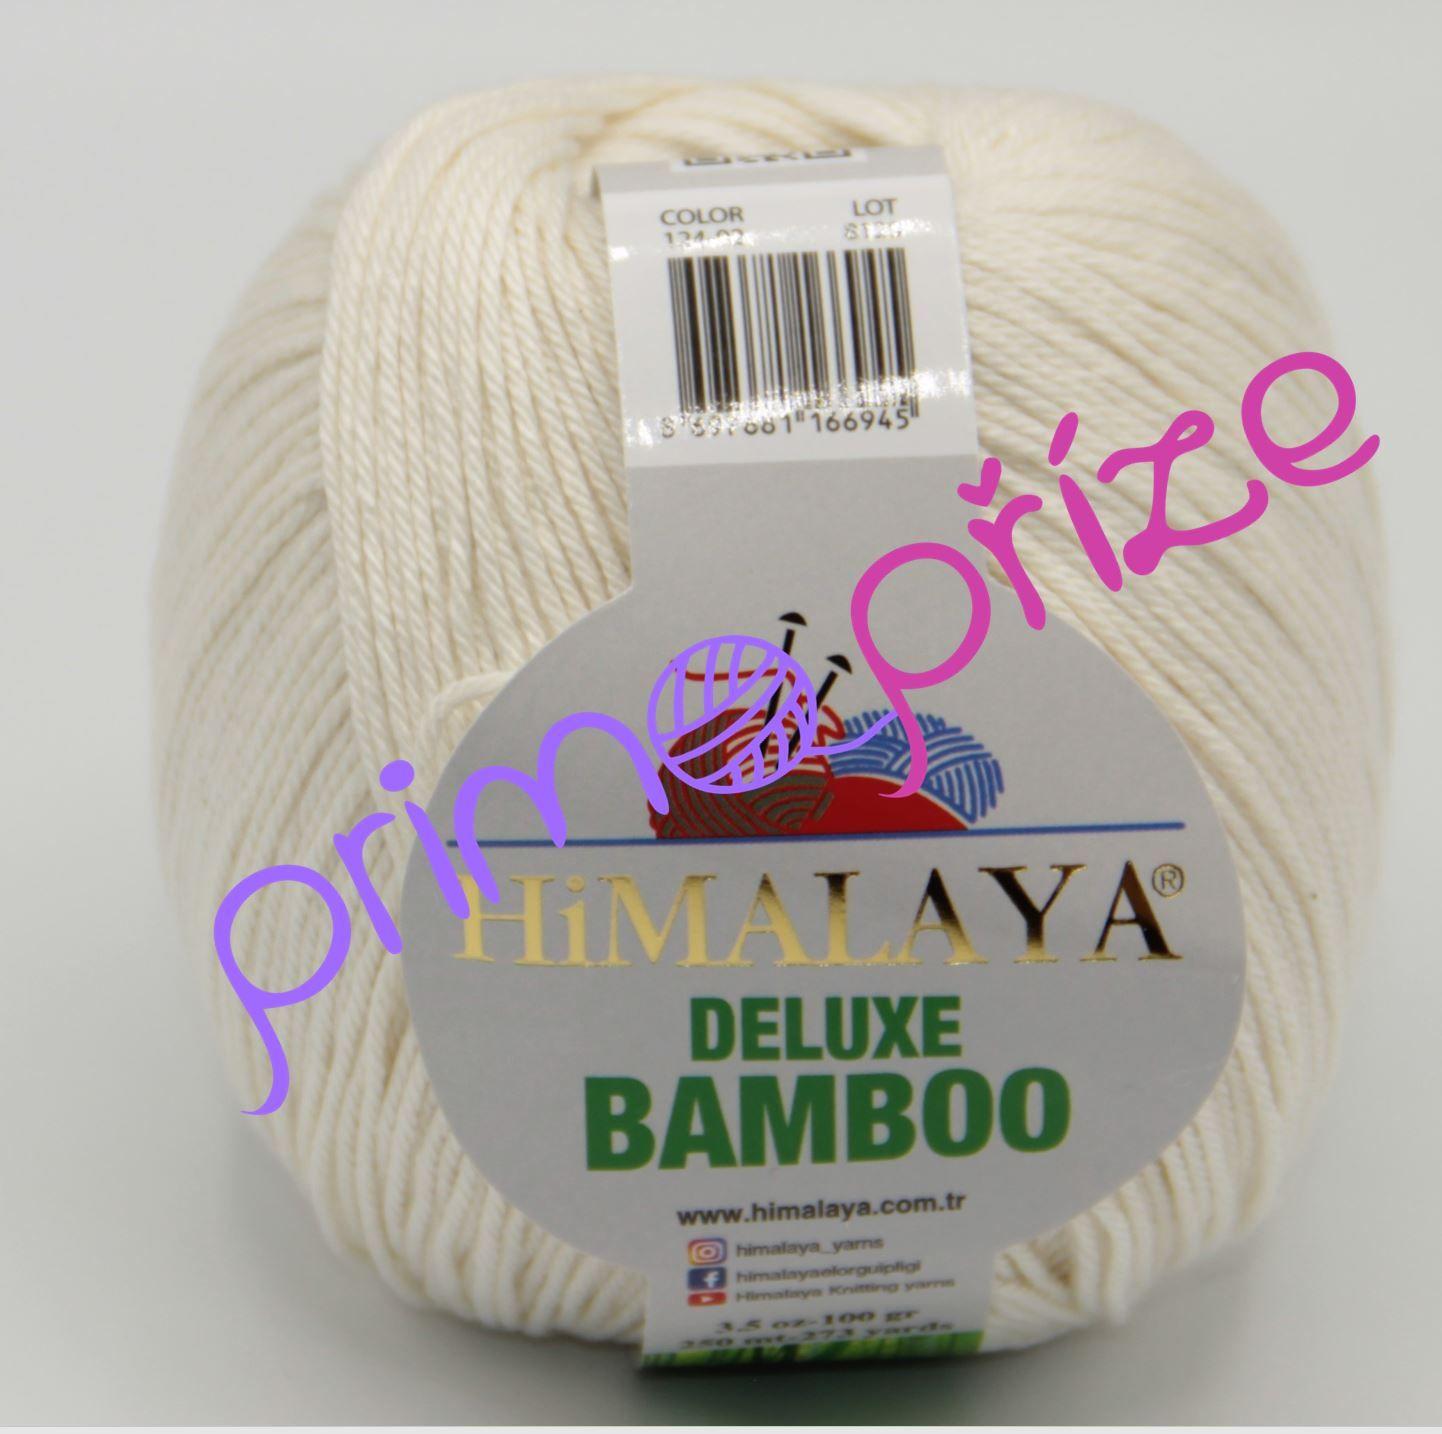 HIMALAYA Deluxe Bamboo 124-02 krémová